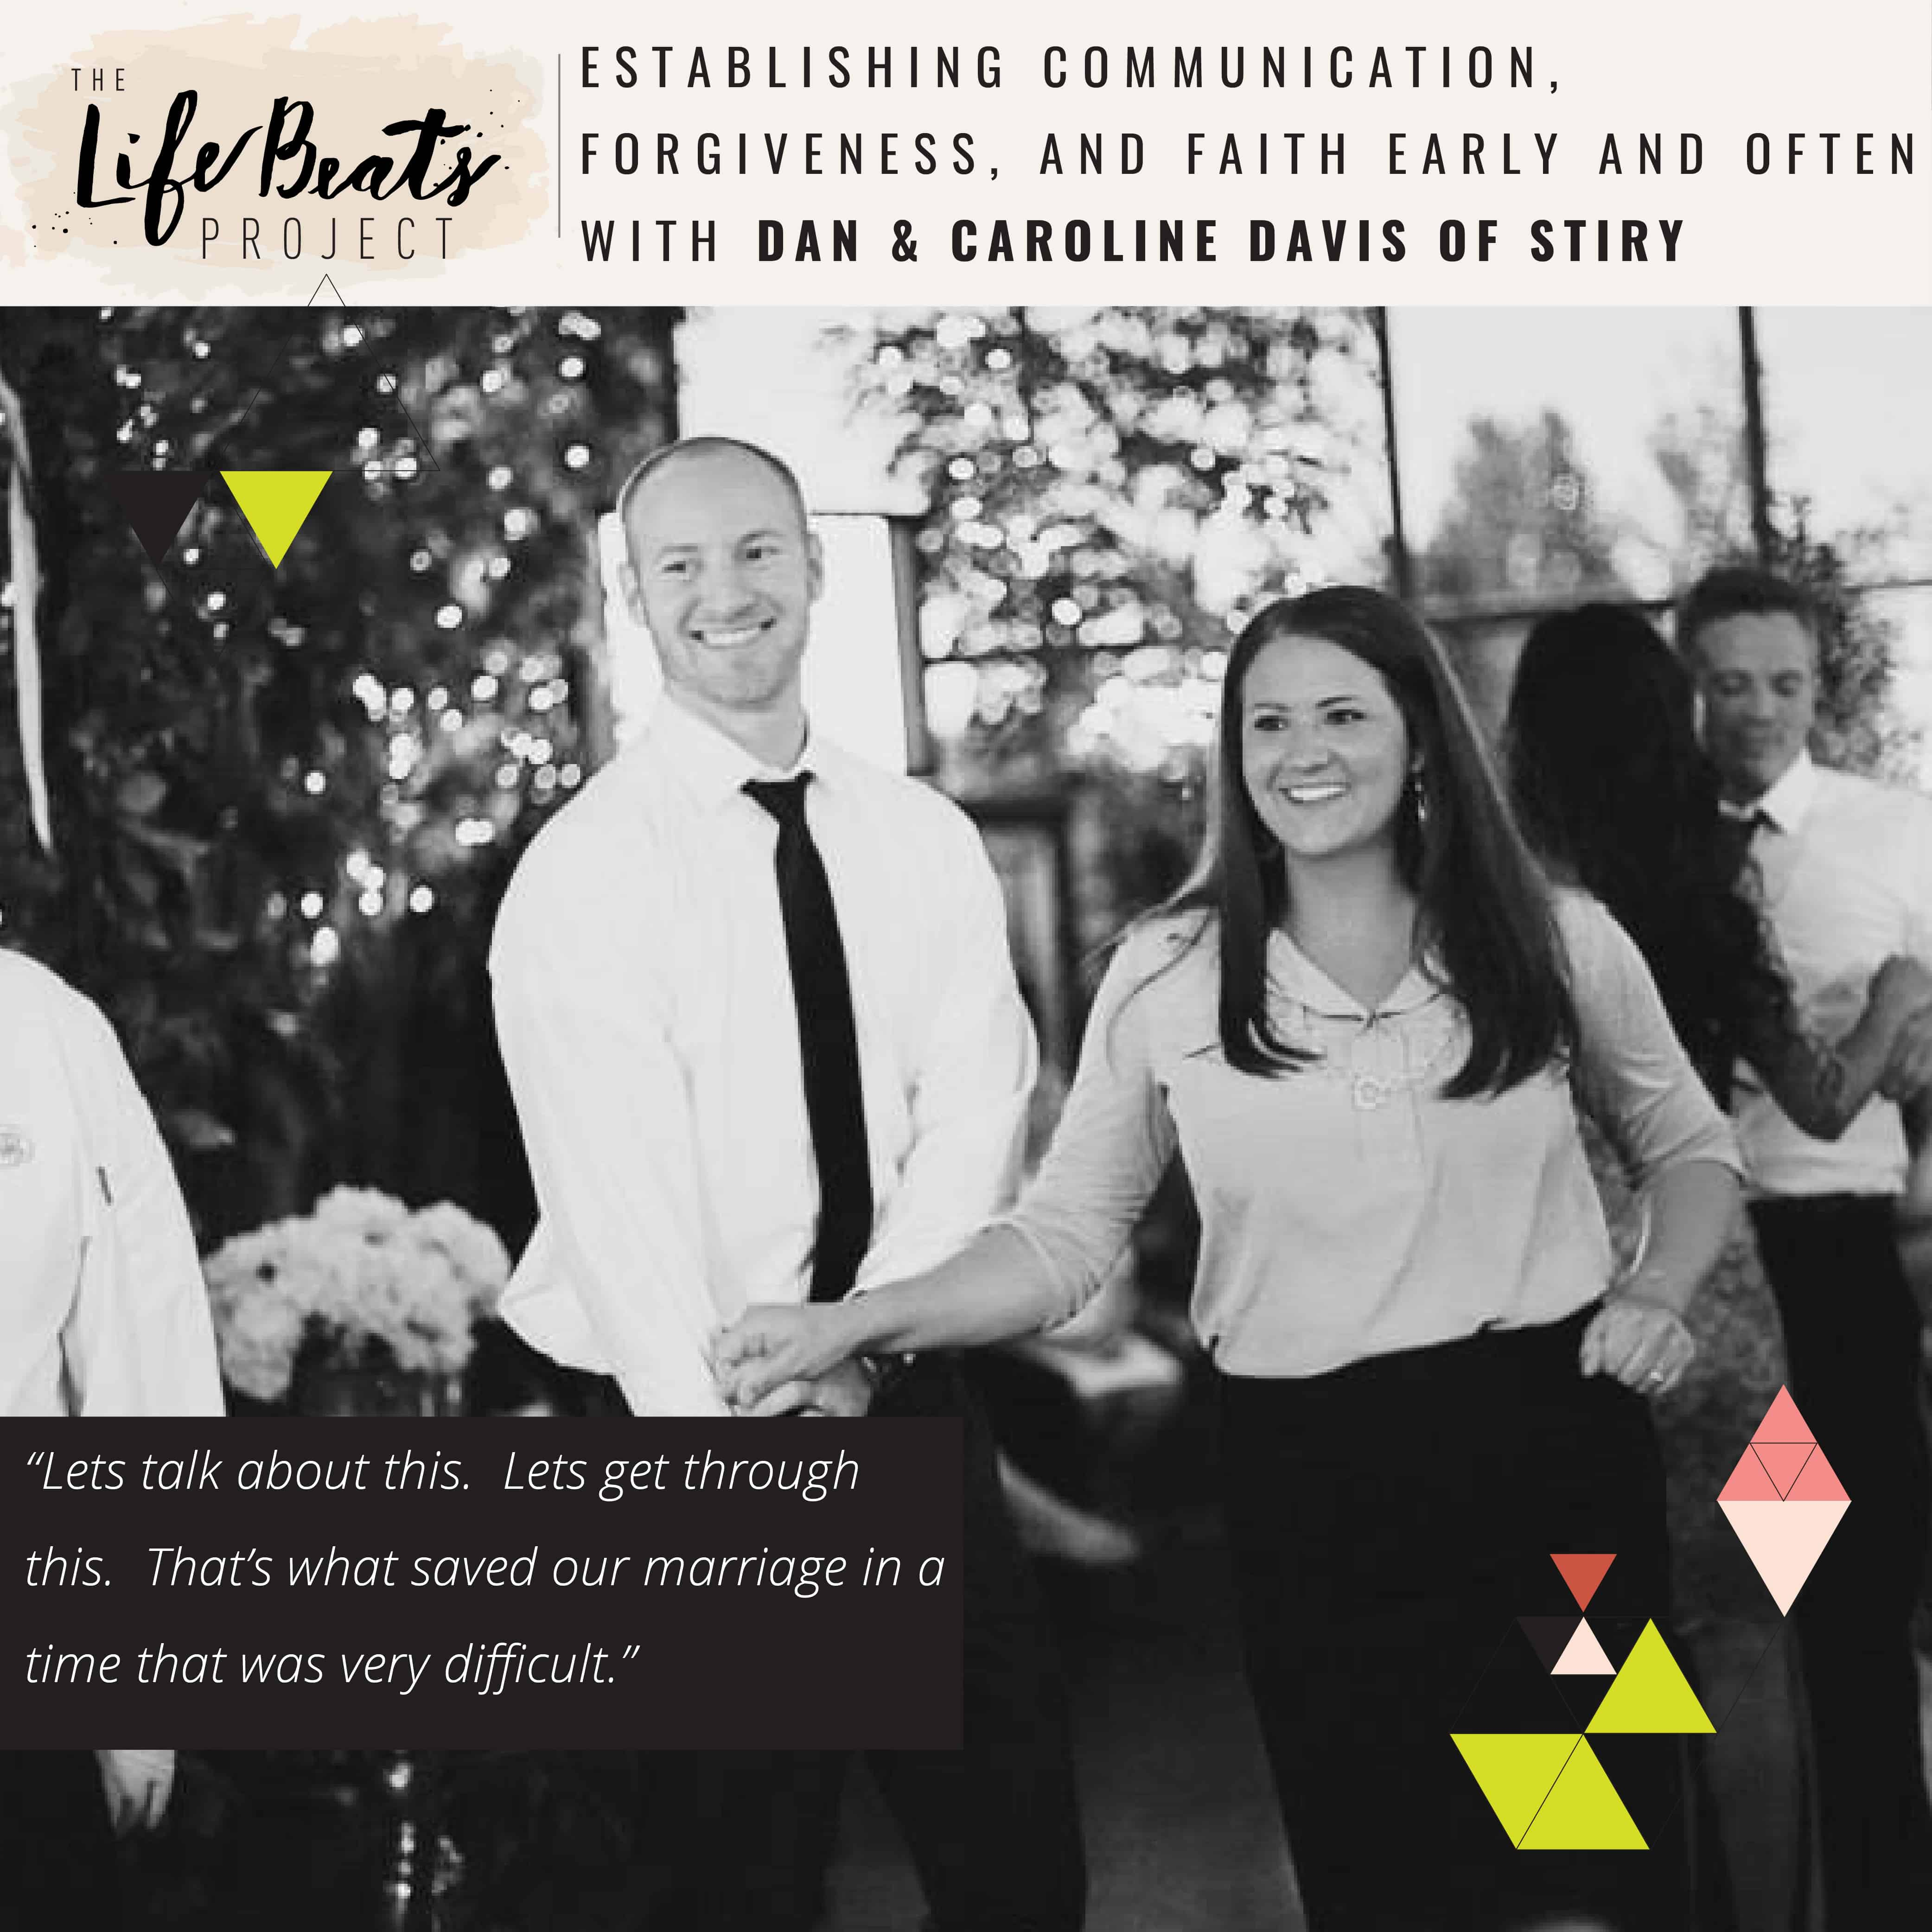 marriage communication forgiveness faith risk entrepreneur Stiry couple